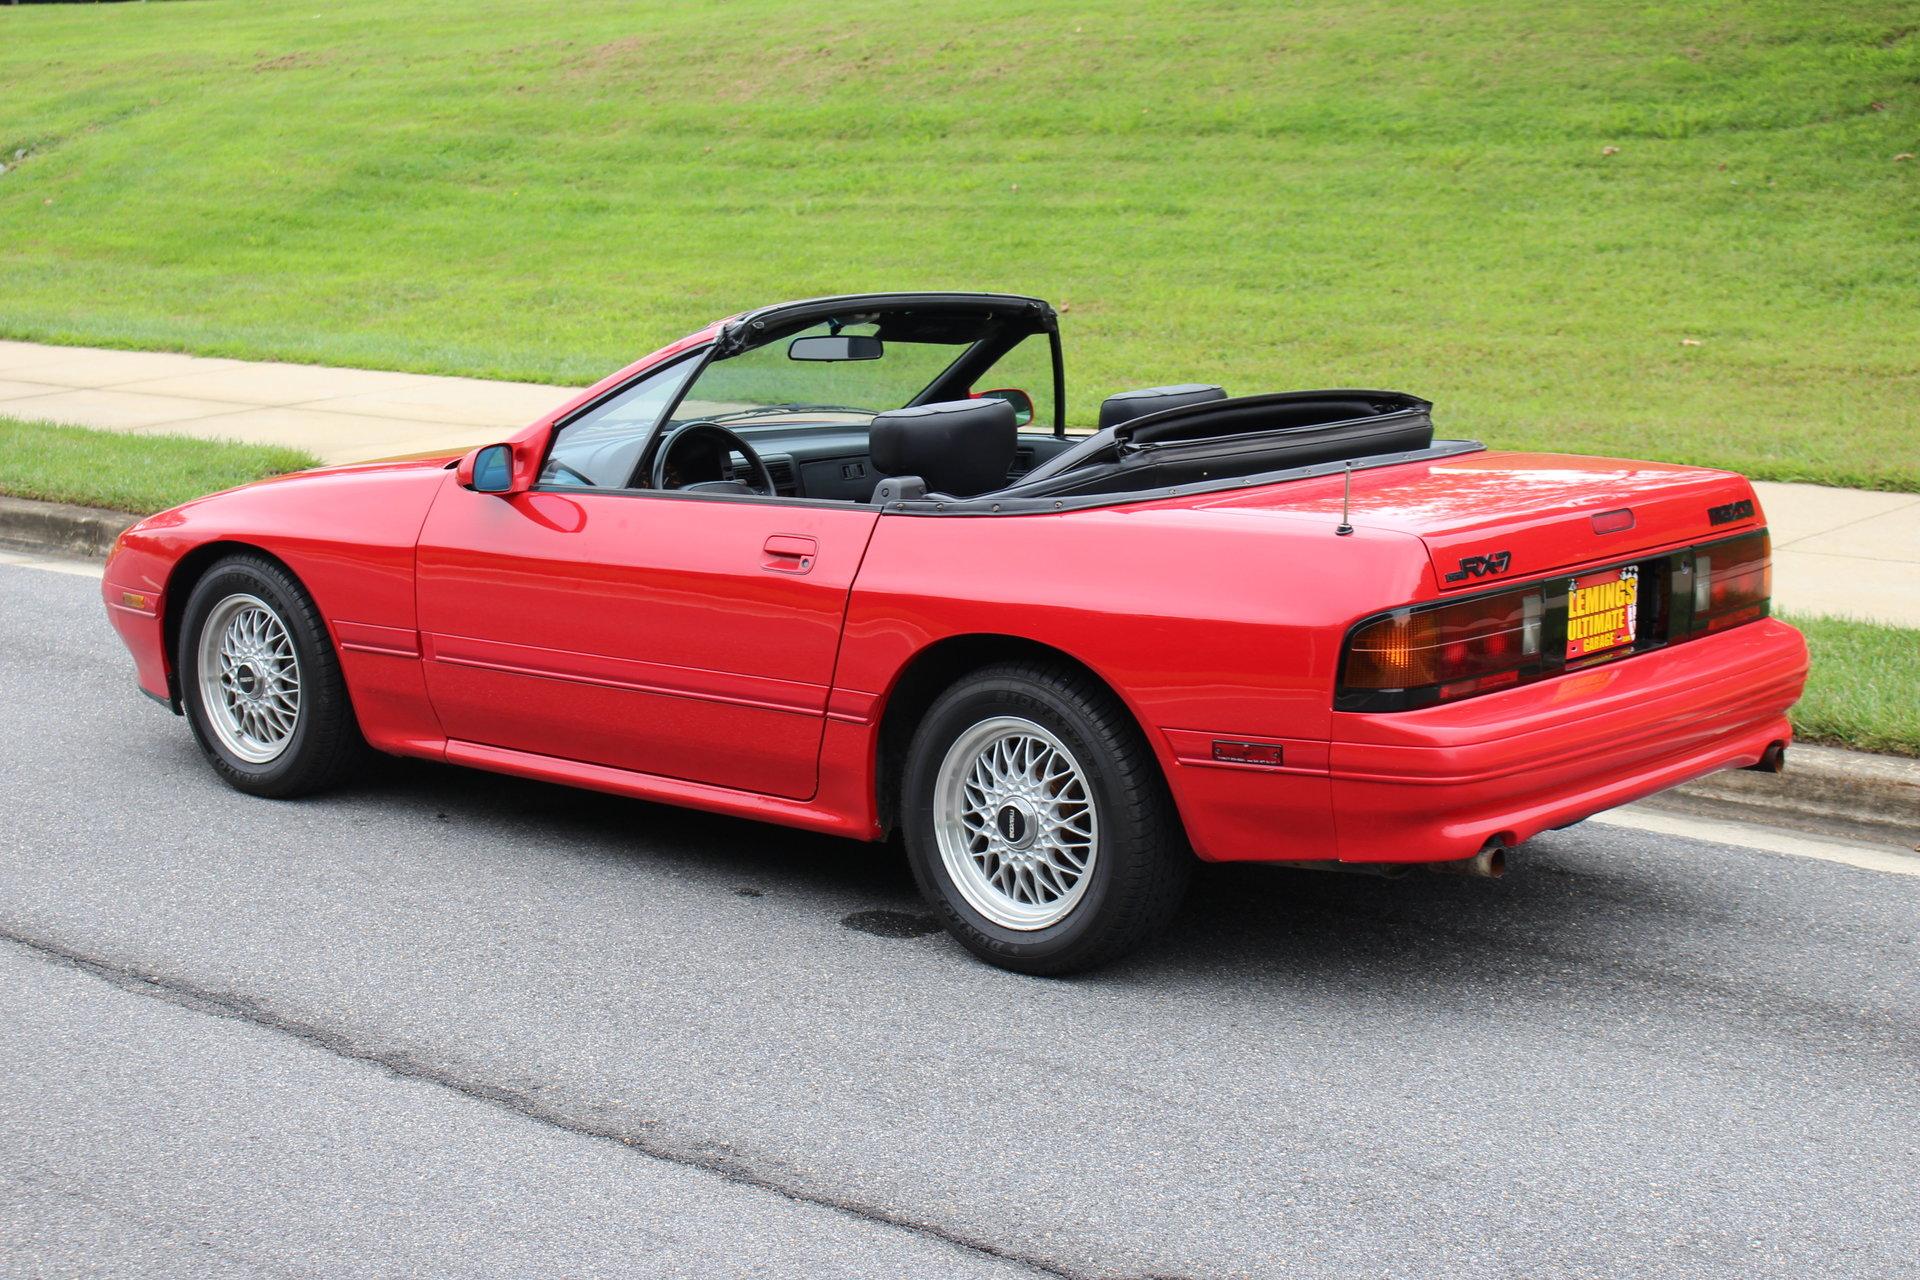 Mazda Dealership Md >> 1991 Mazda RX-7 Convertible for sale #83677   MCG